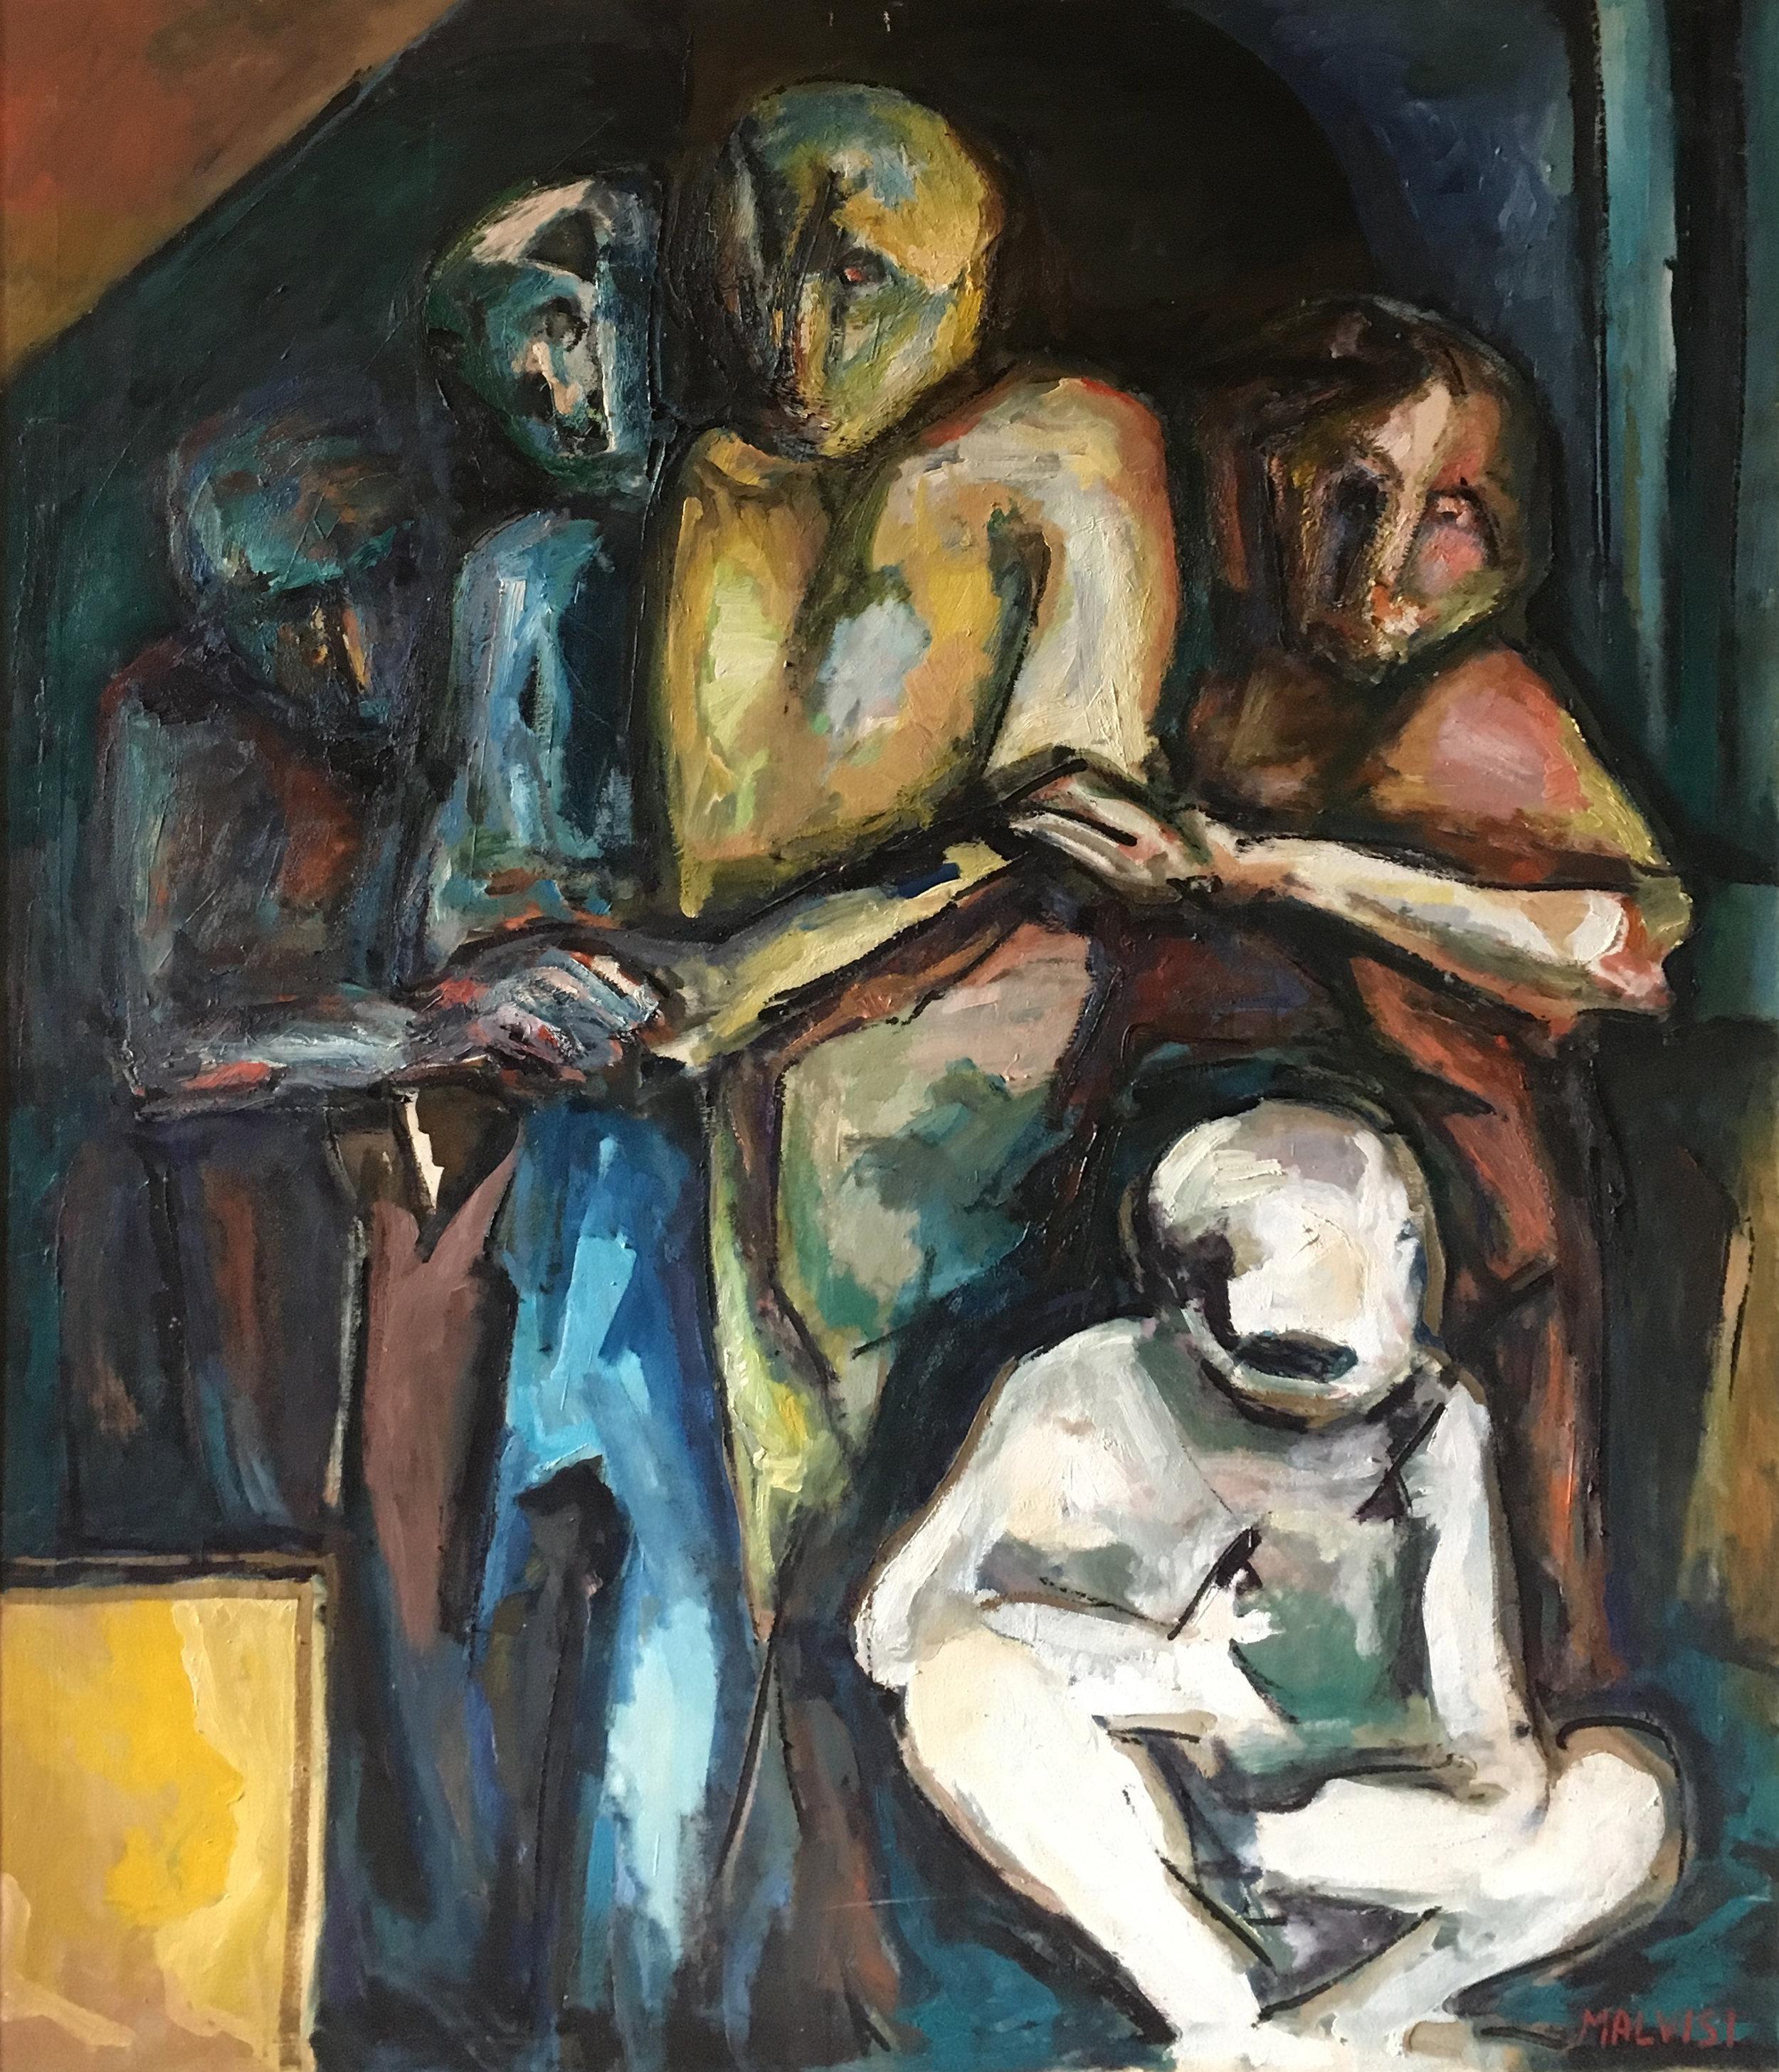 <b>Colloqium 2</b><br> 1984 Oil on canvas <br> cm 120 x 150